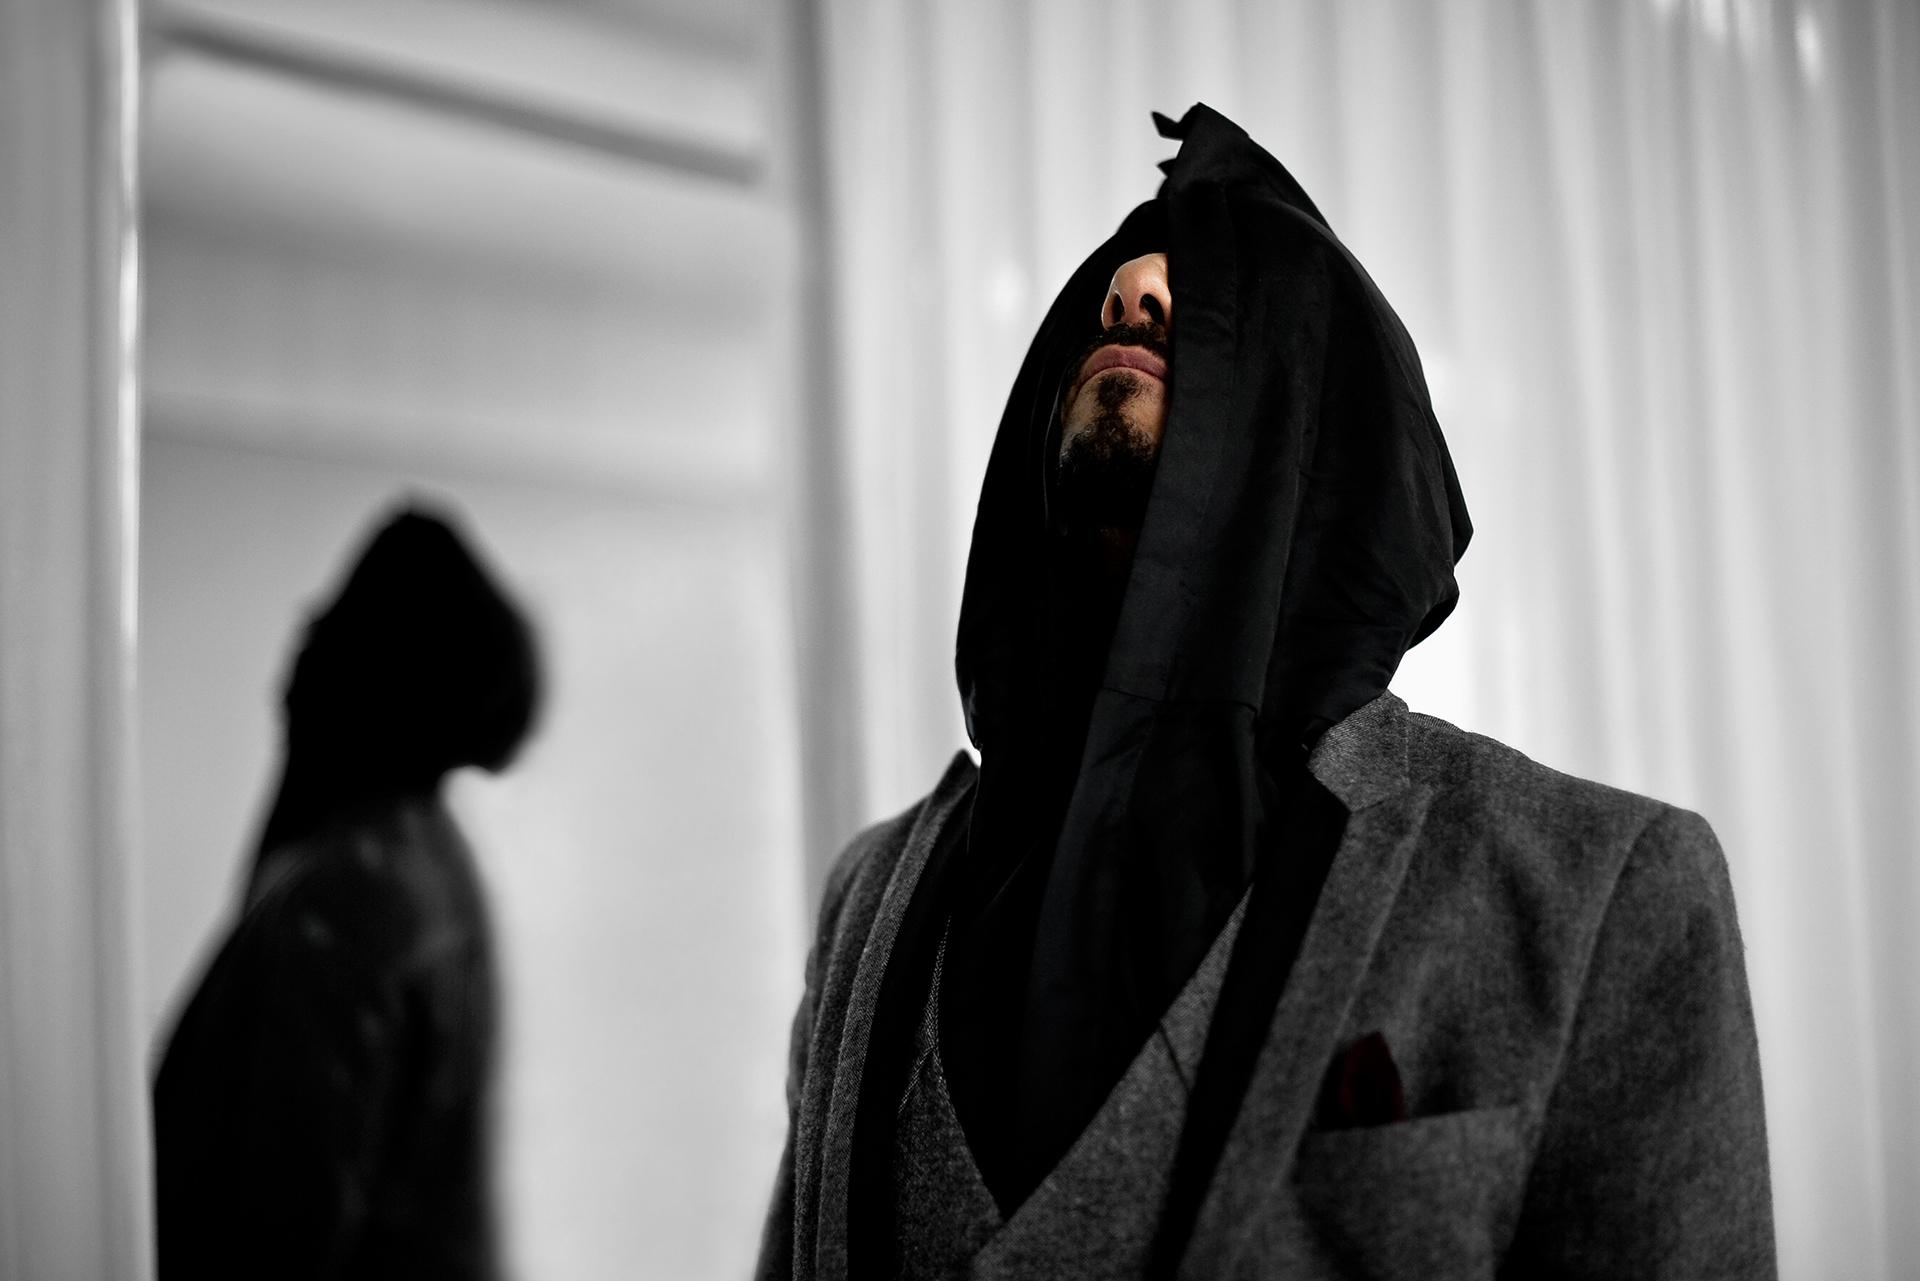 Sabri Saad el Hamus - portret, acteur, theatermaker | Robert van der Ree photography - portraits